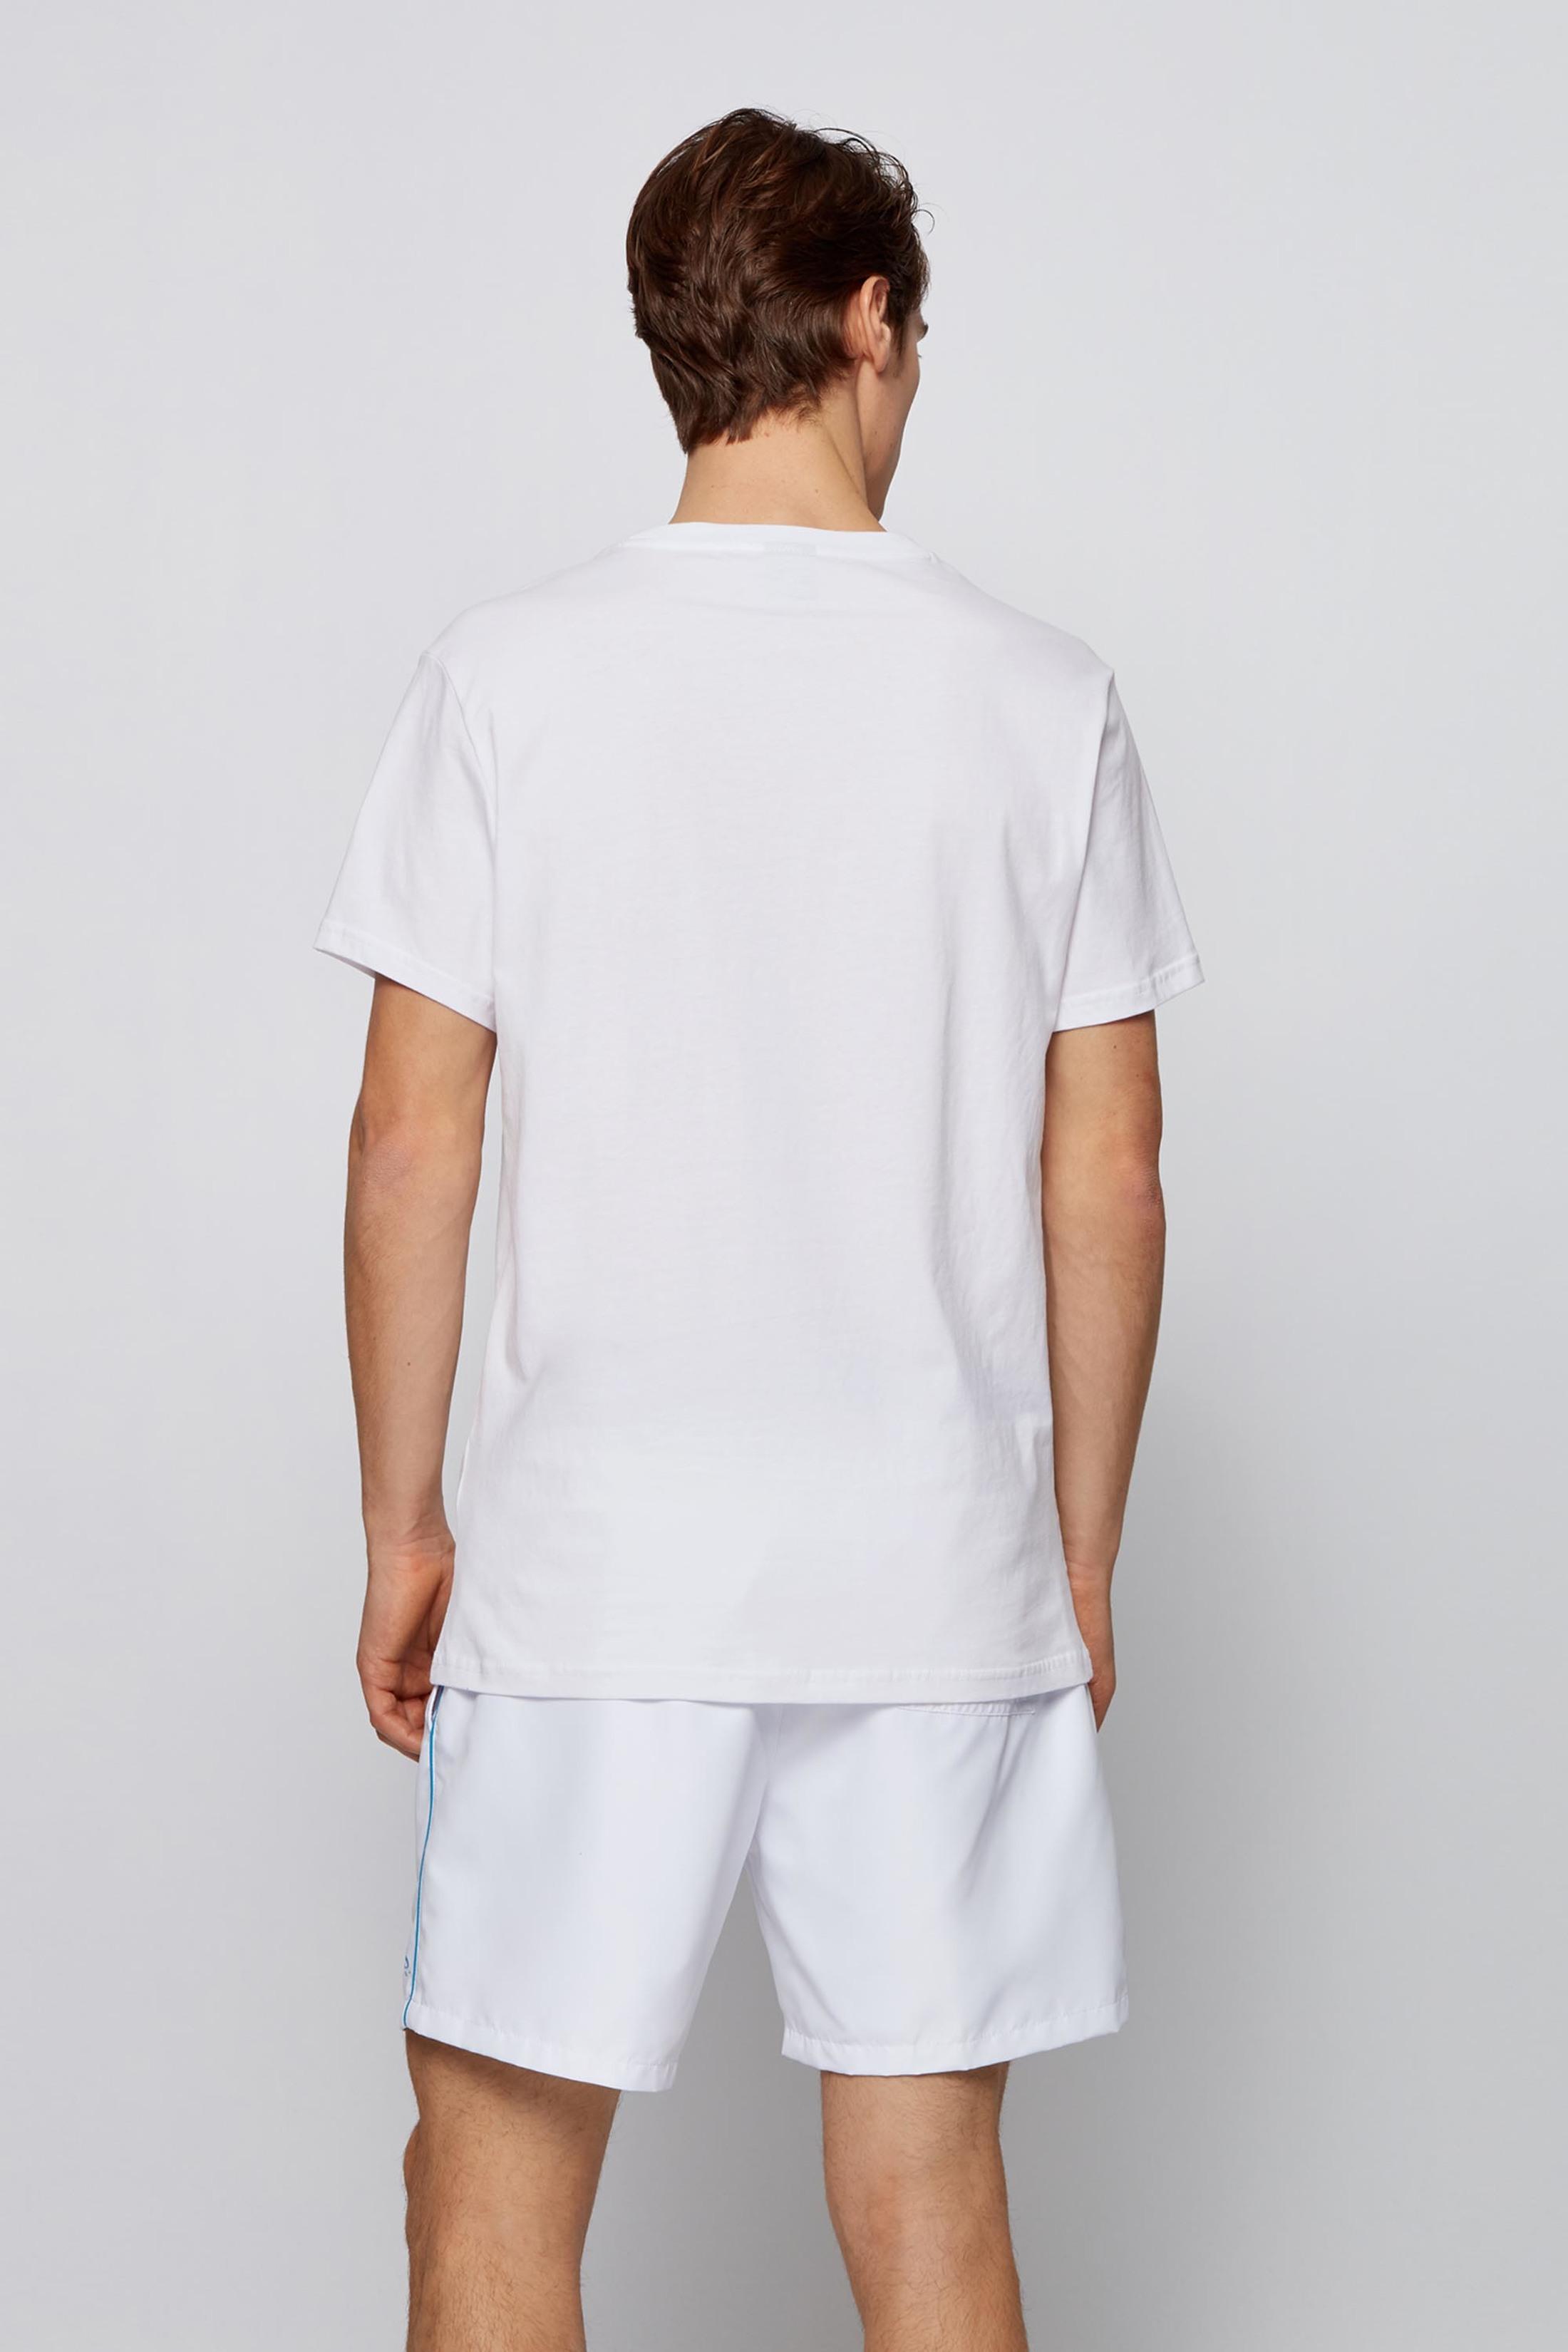 Hugo Boss T-shirt UV-Protection Wit